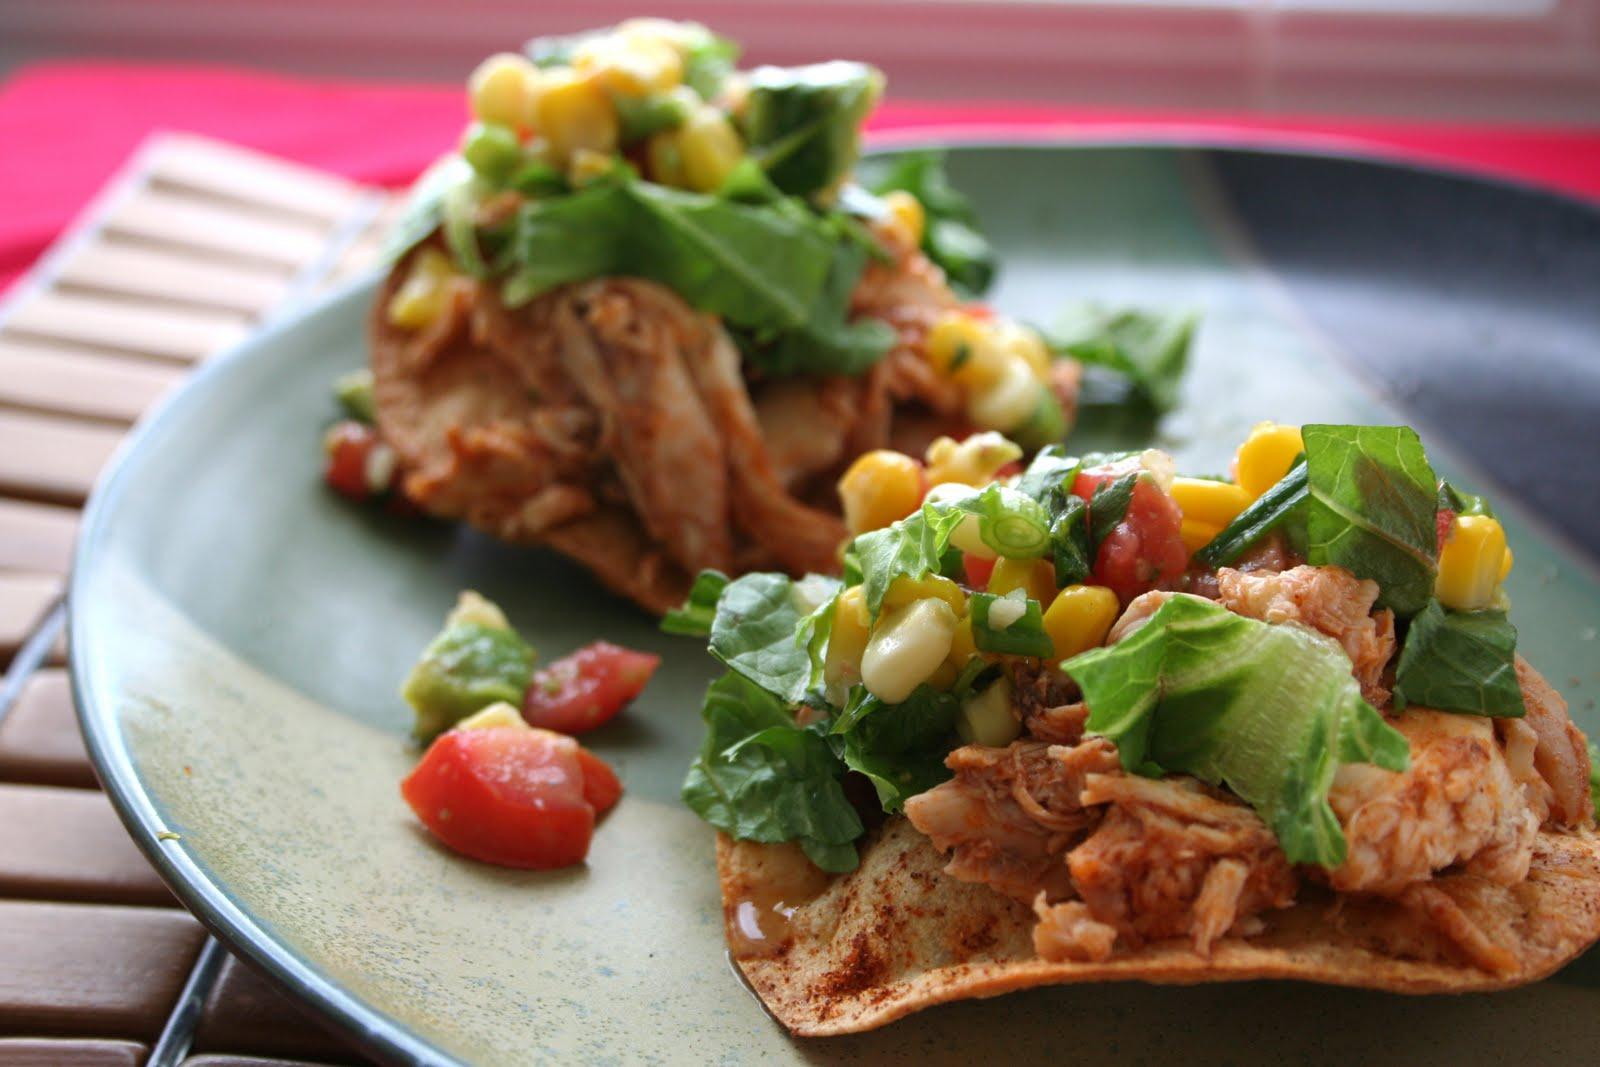 Meal Planning 101: BBQ Ranch Chicken Tostadas with Avocado Corn Salsa